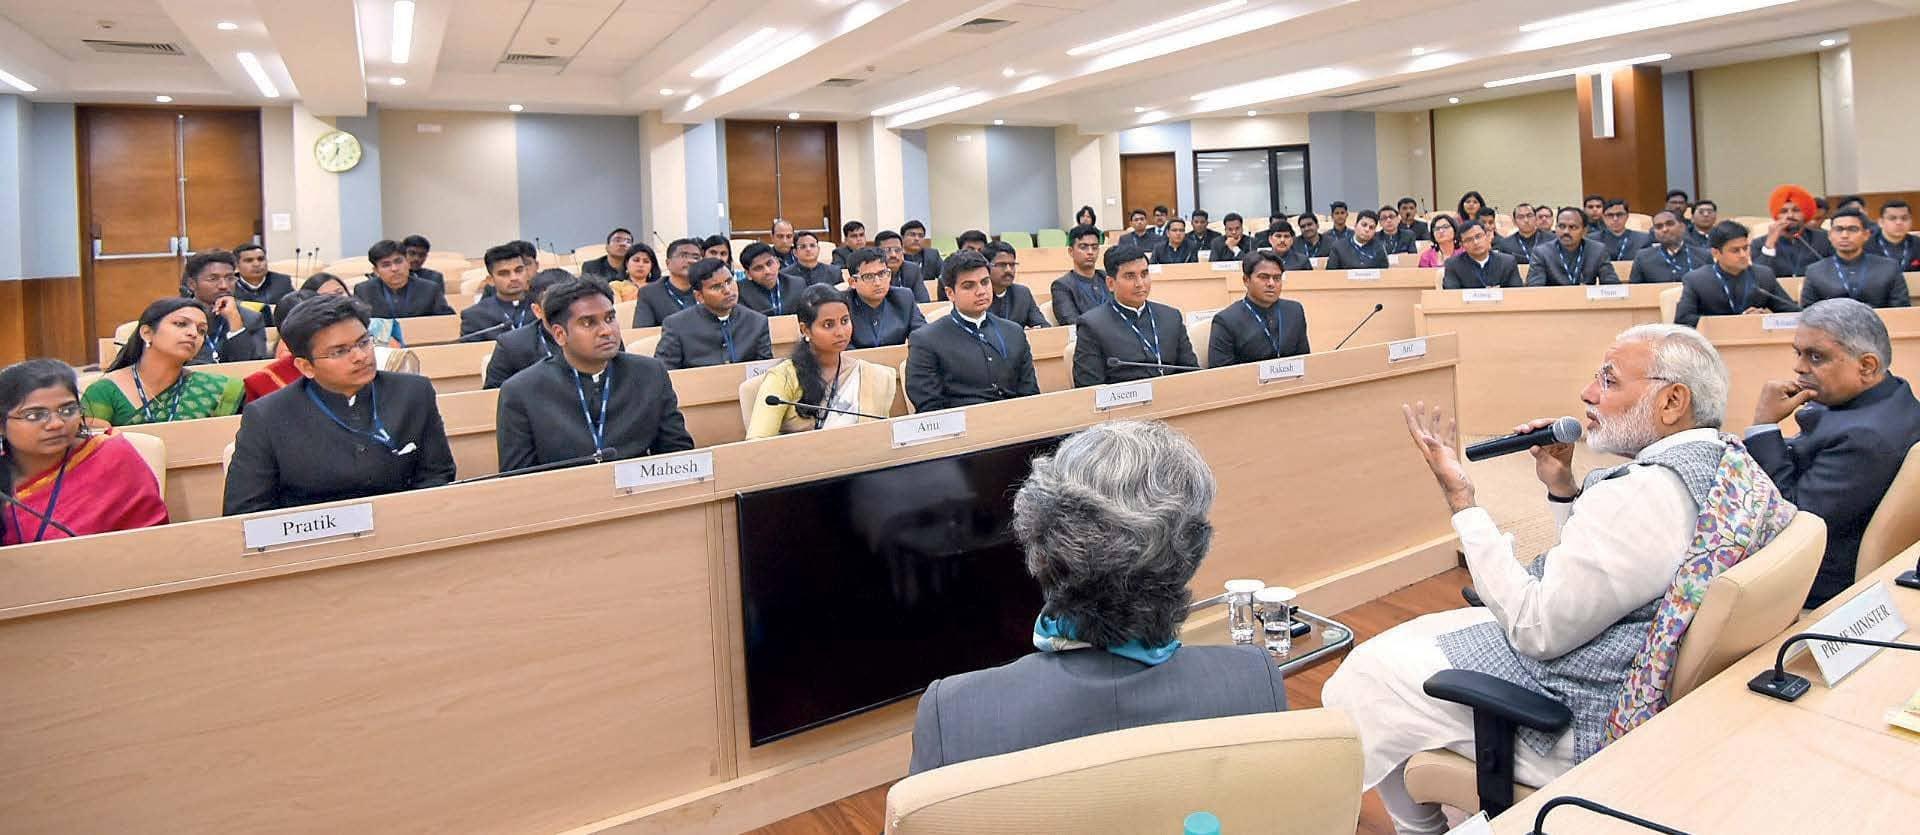 Narendra Modi Plans To Transform The Bureaucracy Into A Future-Ready Service